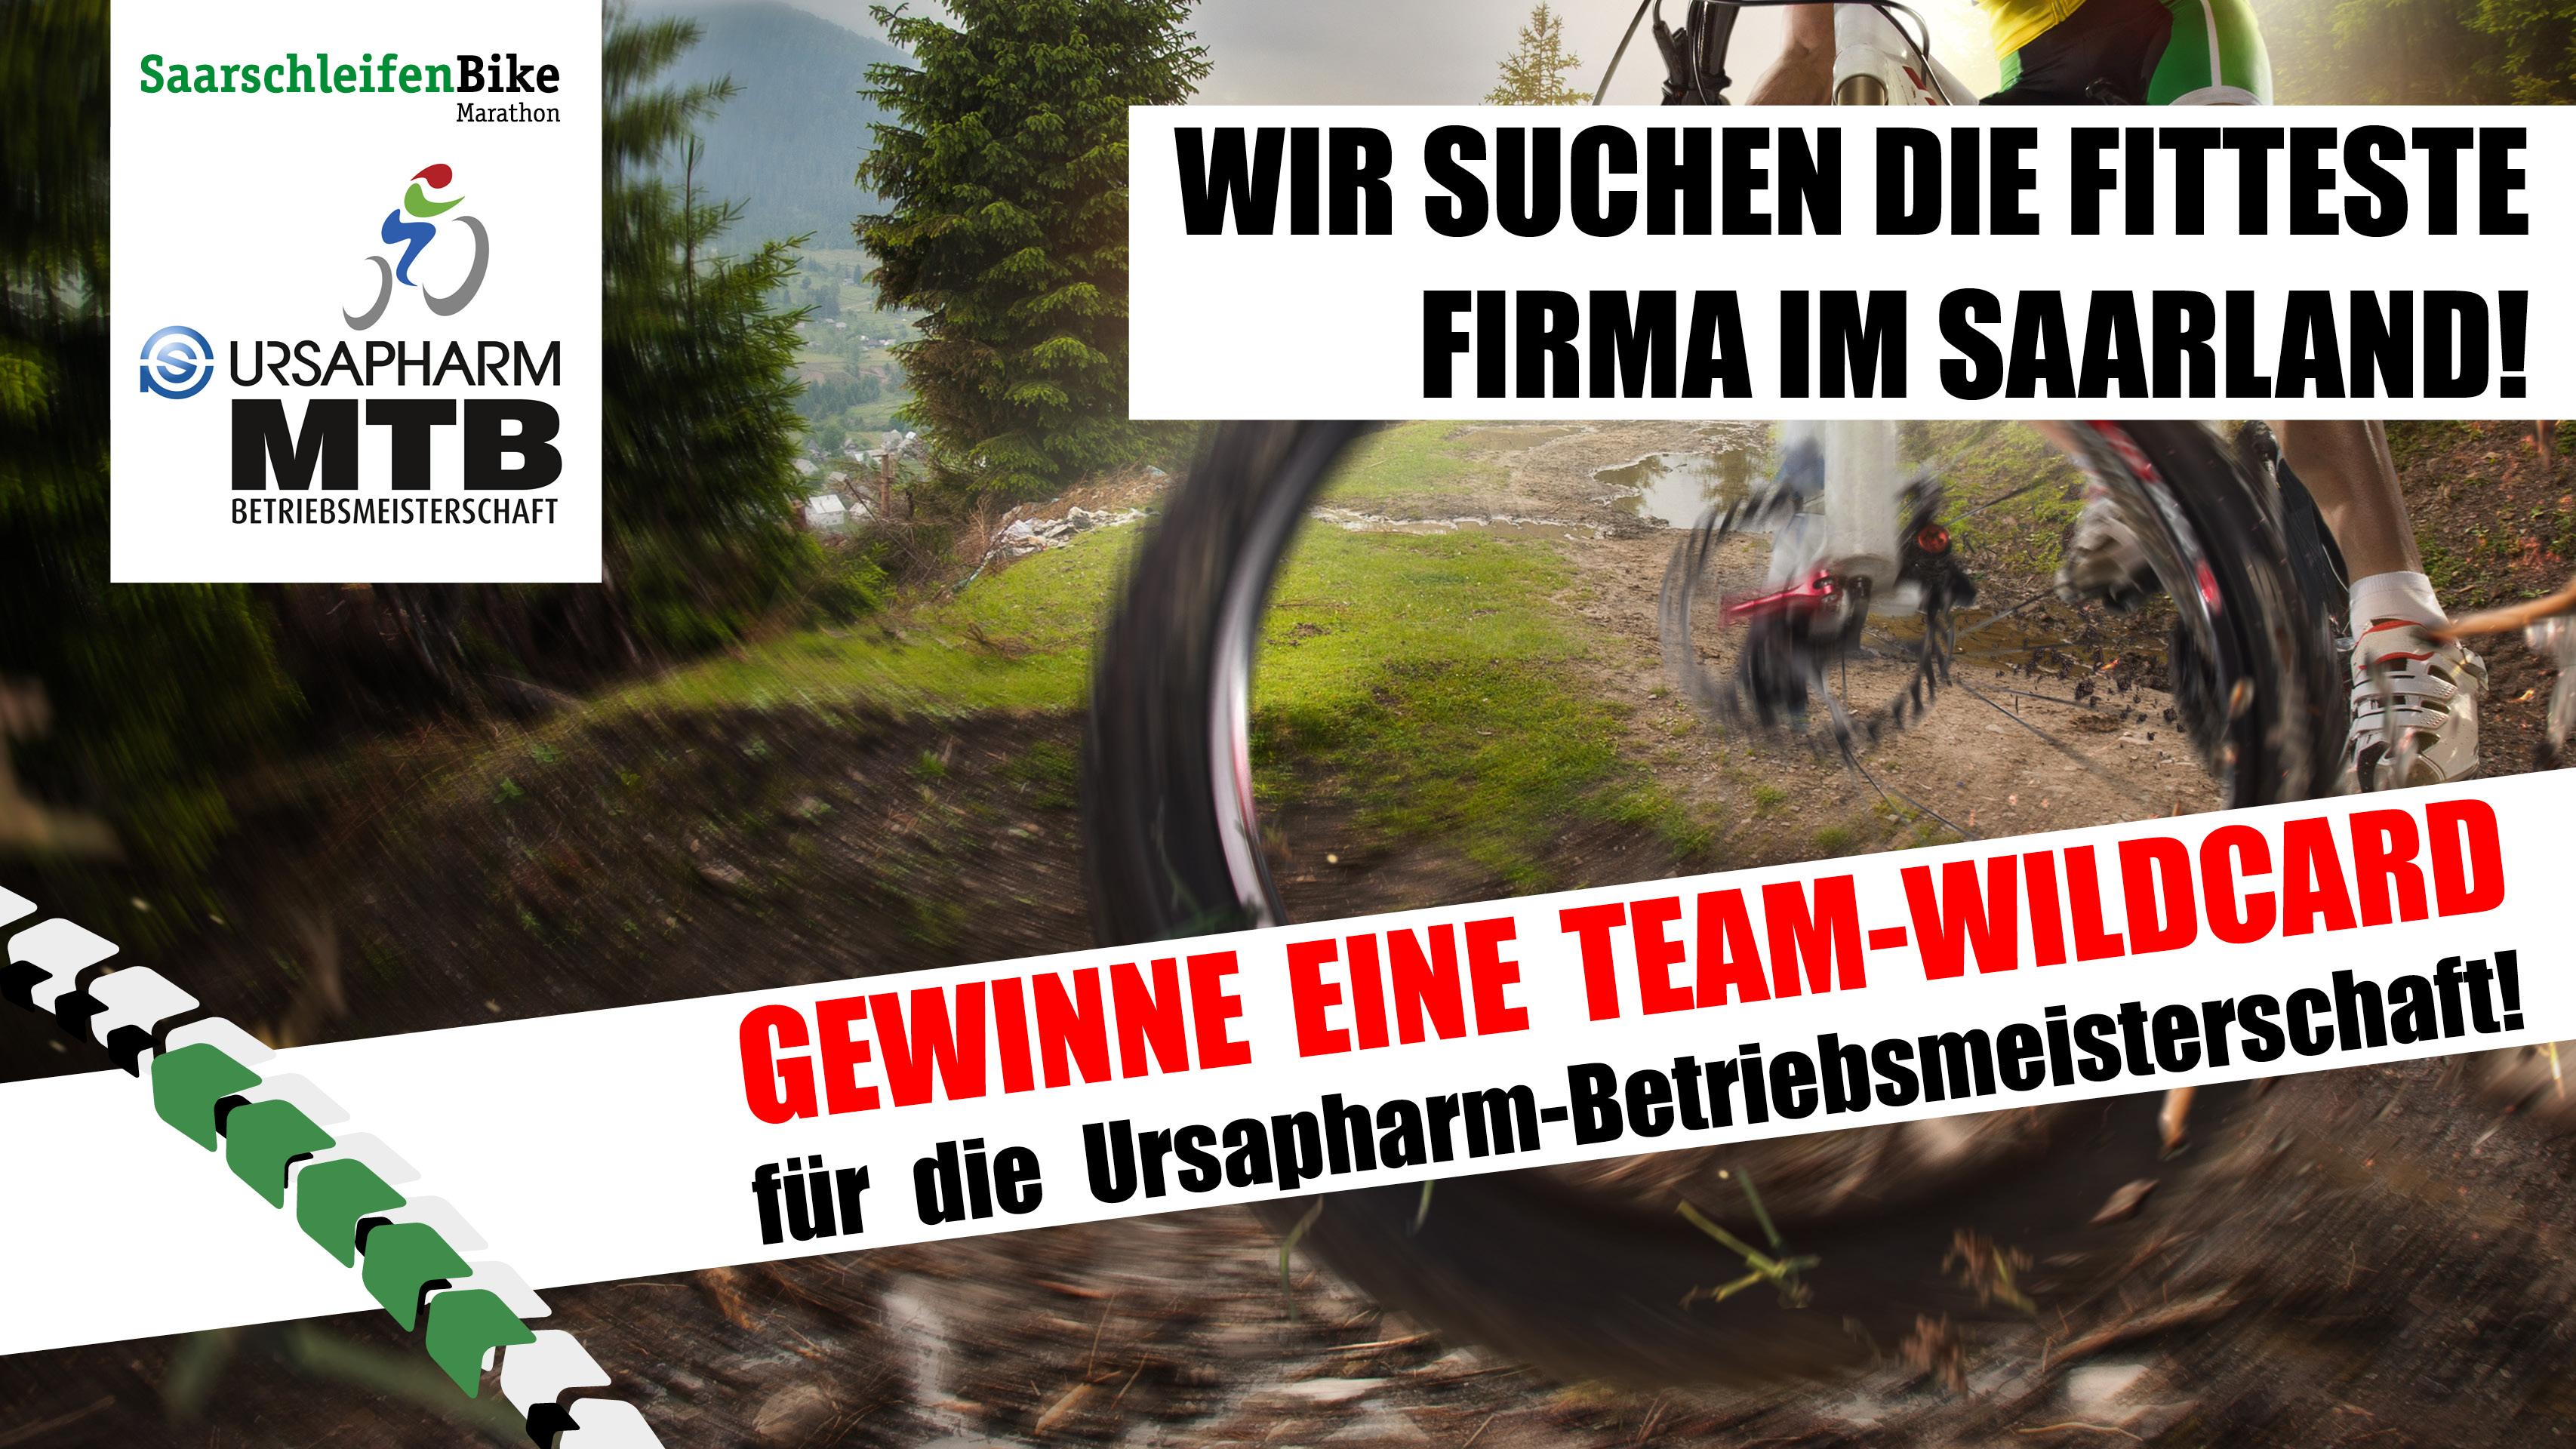 Ursapharm Betriebsmeisterschaft SaarschleifenBike